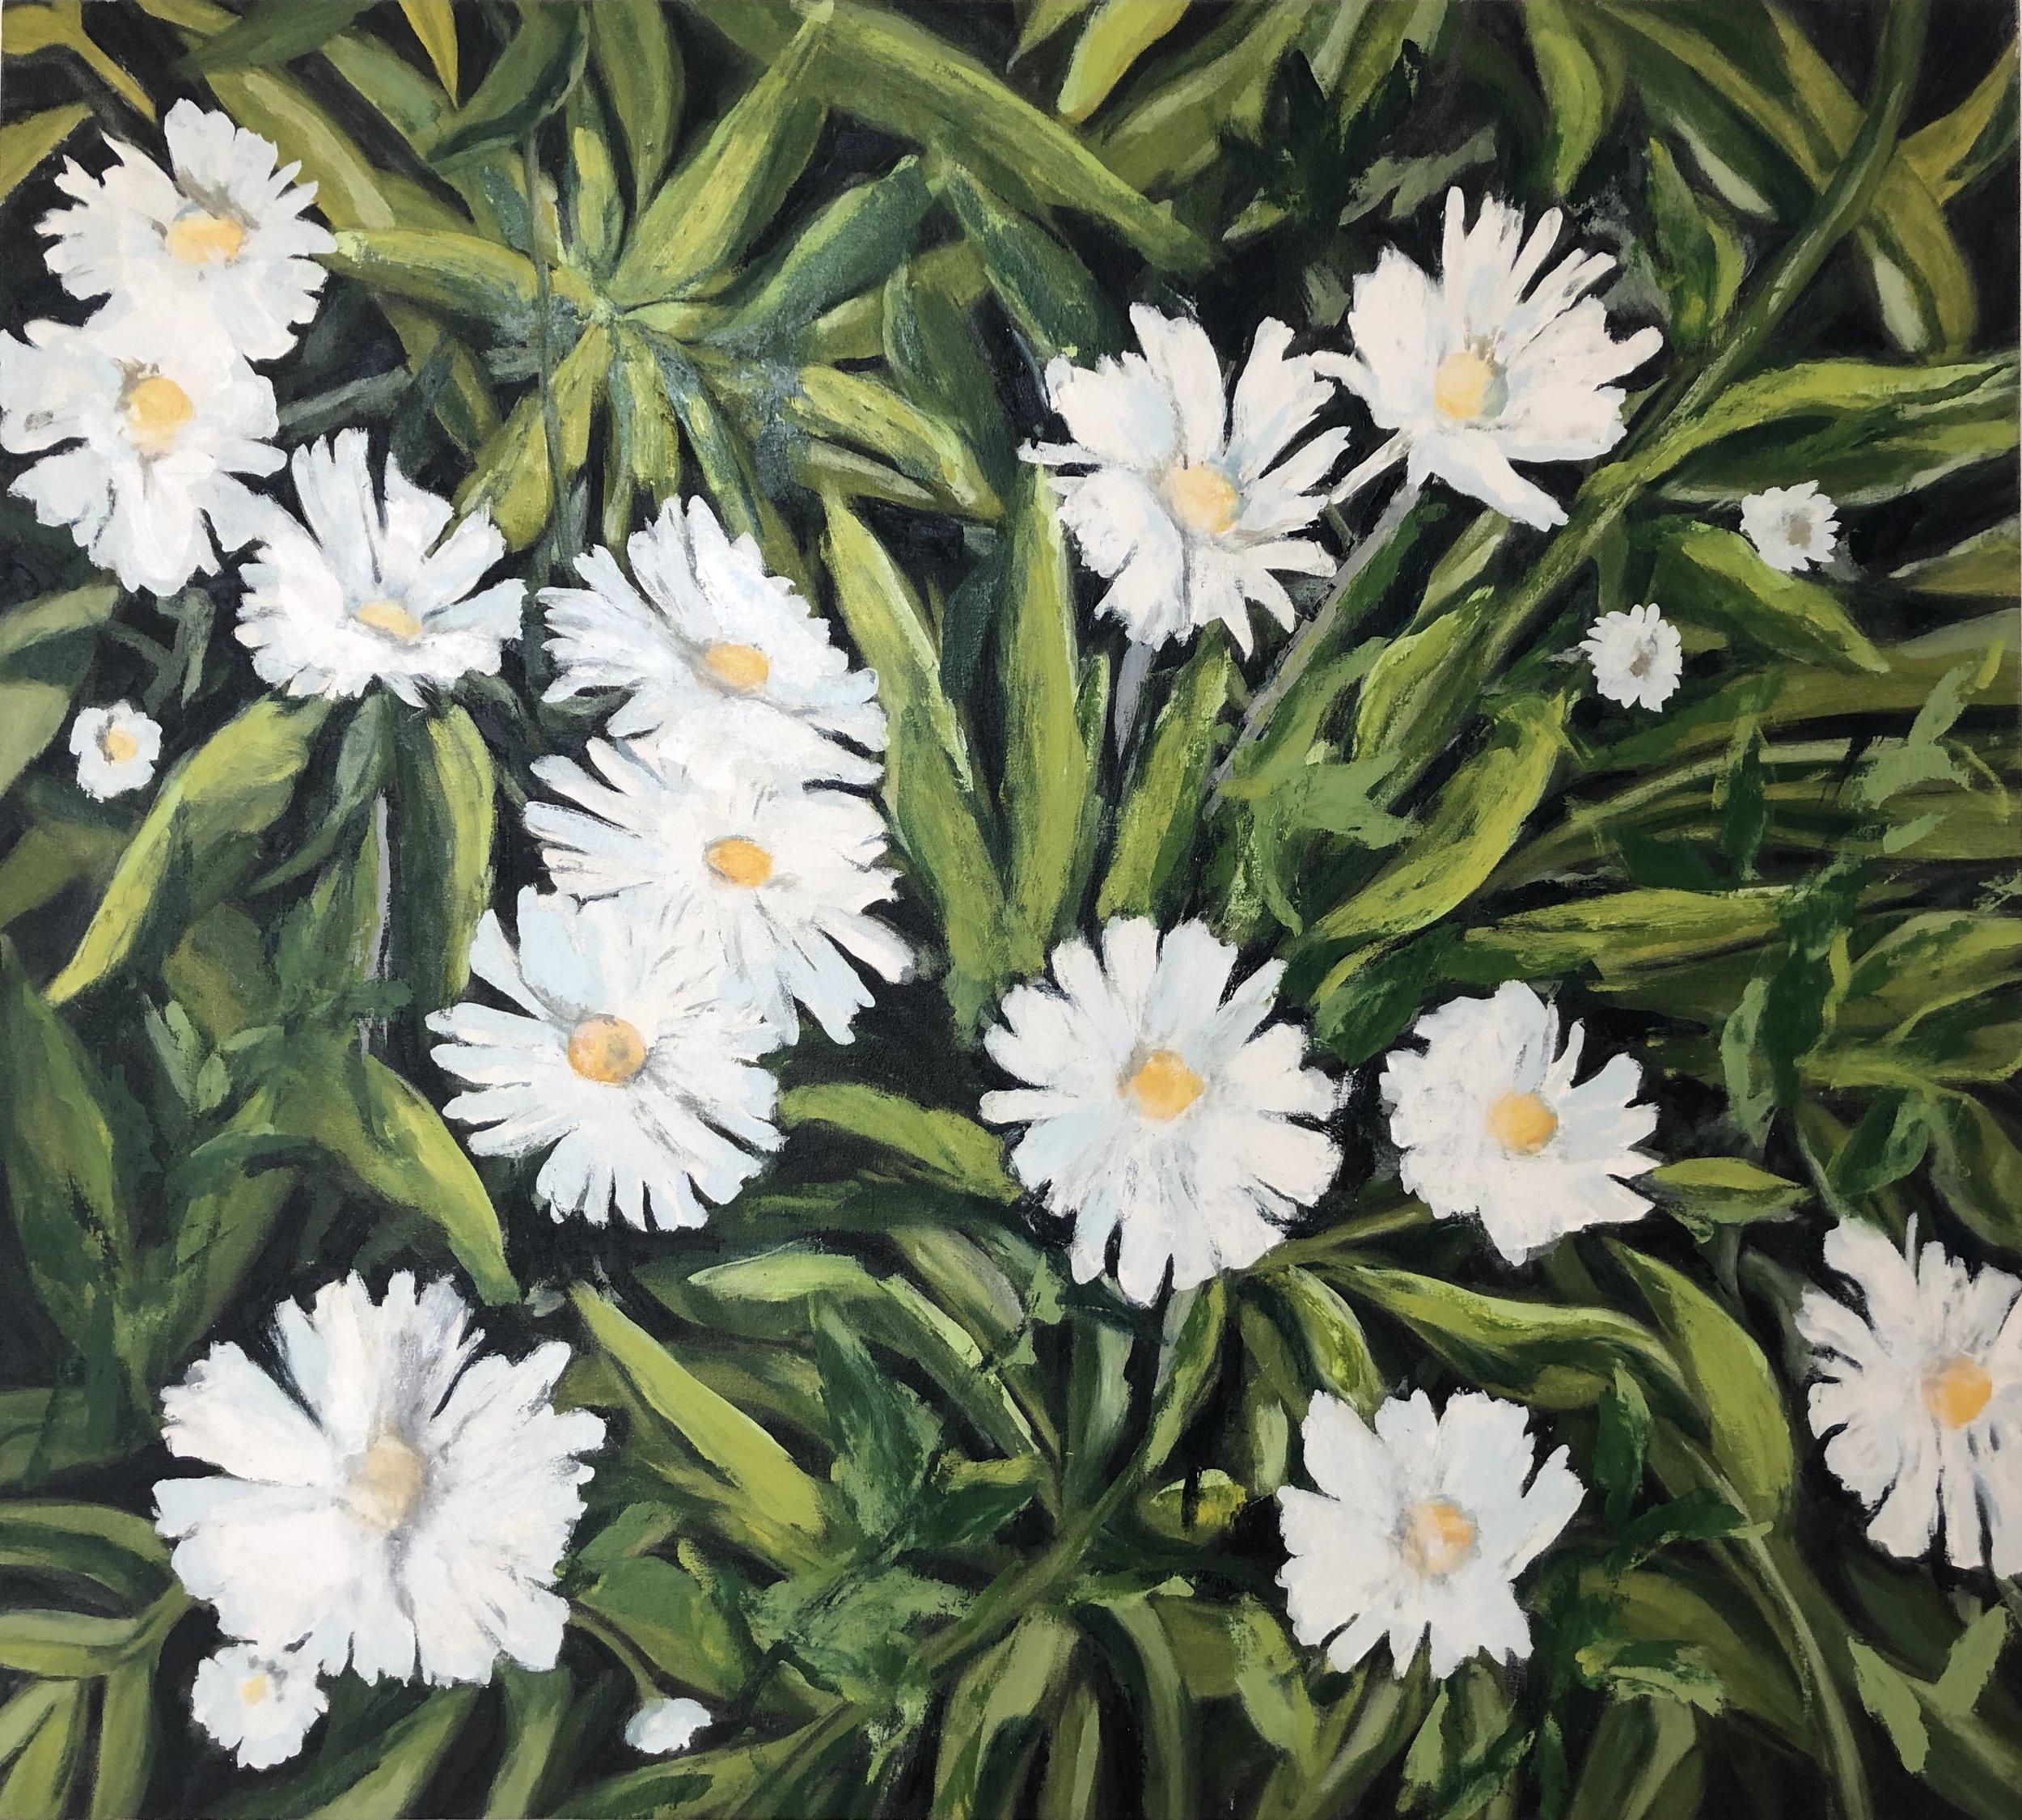 Wildflower Series 1, 2009, oil, canvas, 42 x 47 in, $7,800